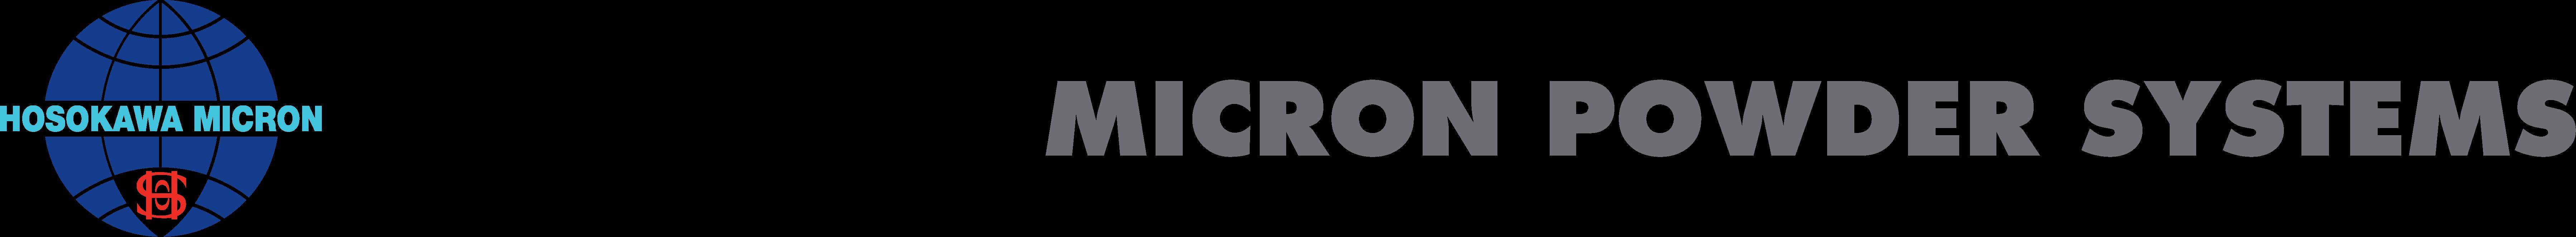 HMPS-Logo-Art-new-1--line-large